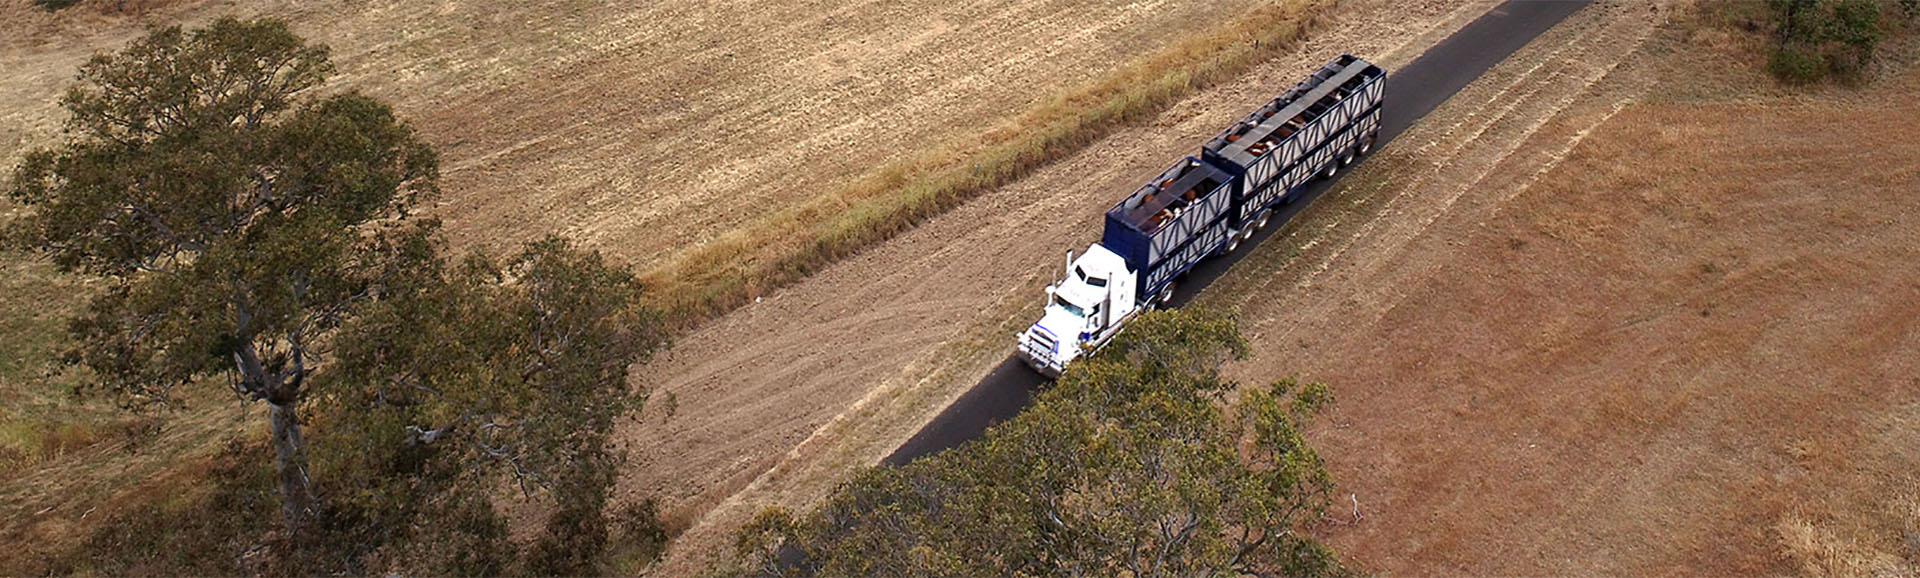 Cattle truck driving through Australian outback